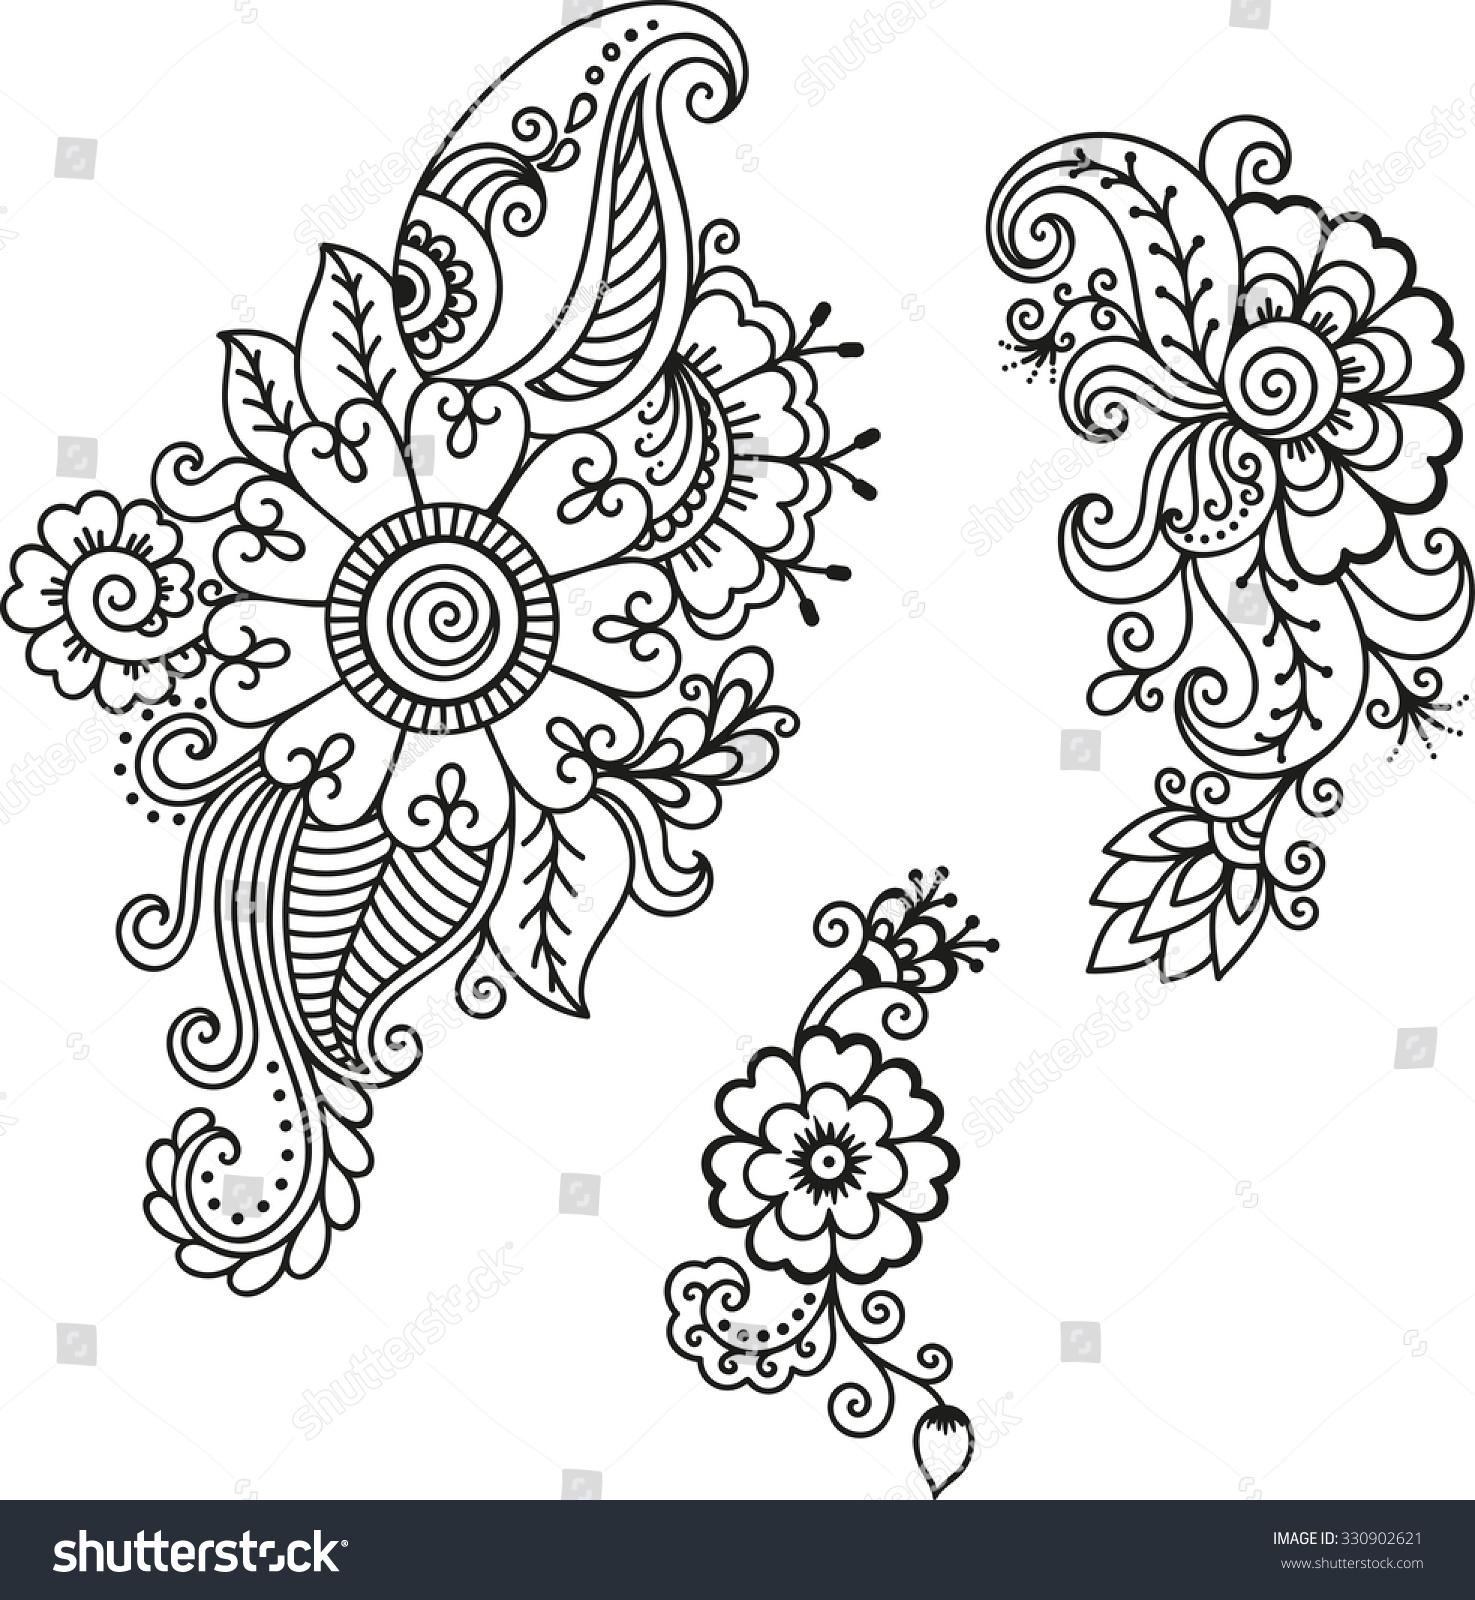 Henna Design Outline: Henna Tattoo Flower Templatemehndi Stock Vector 330902621